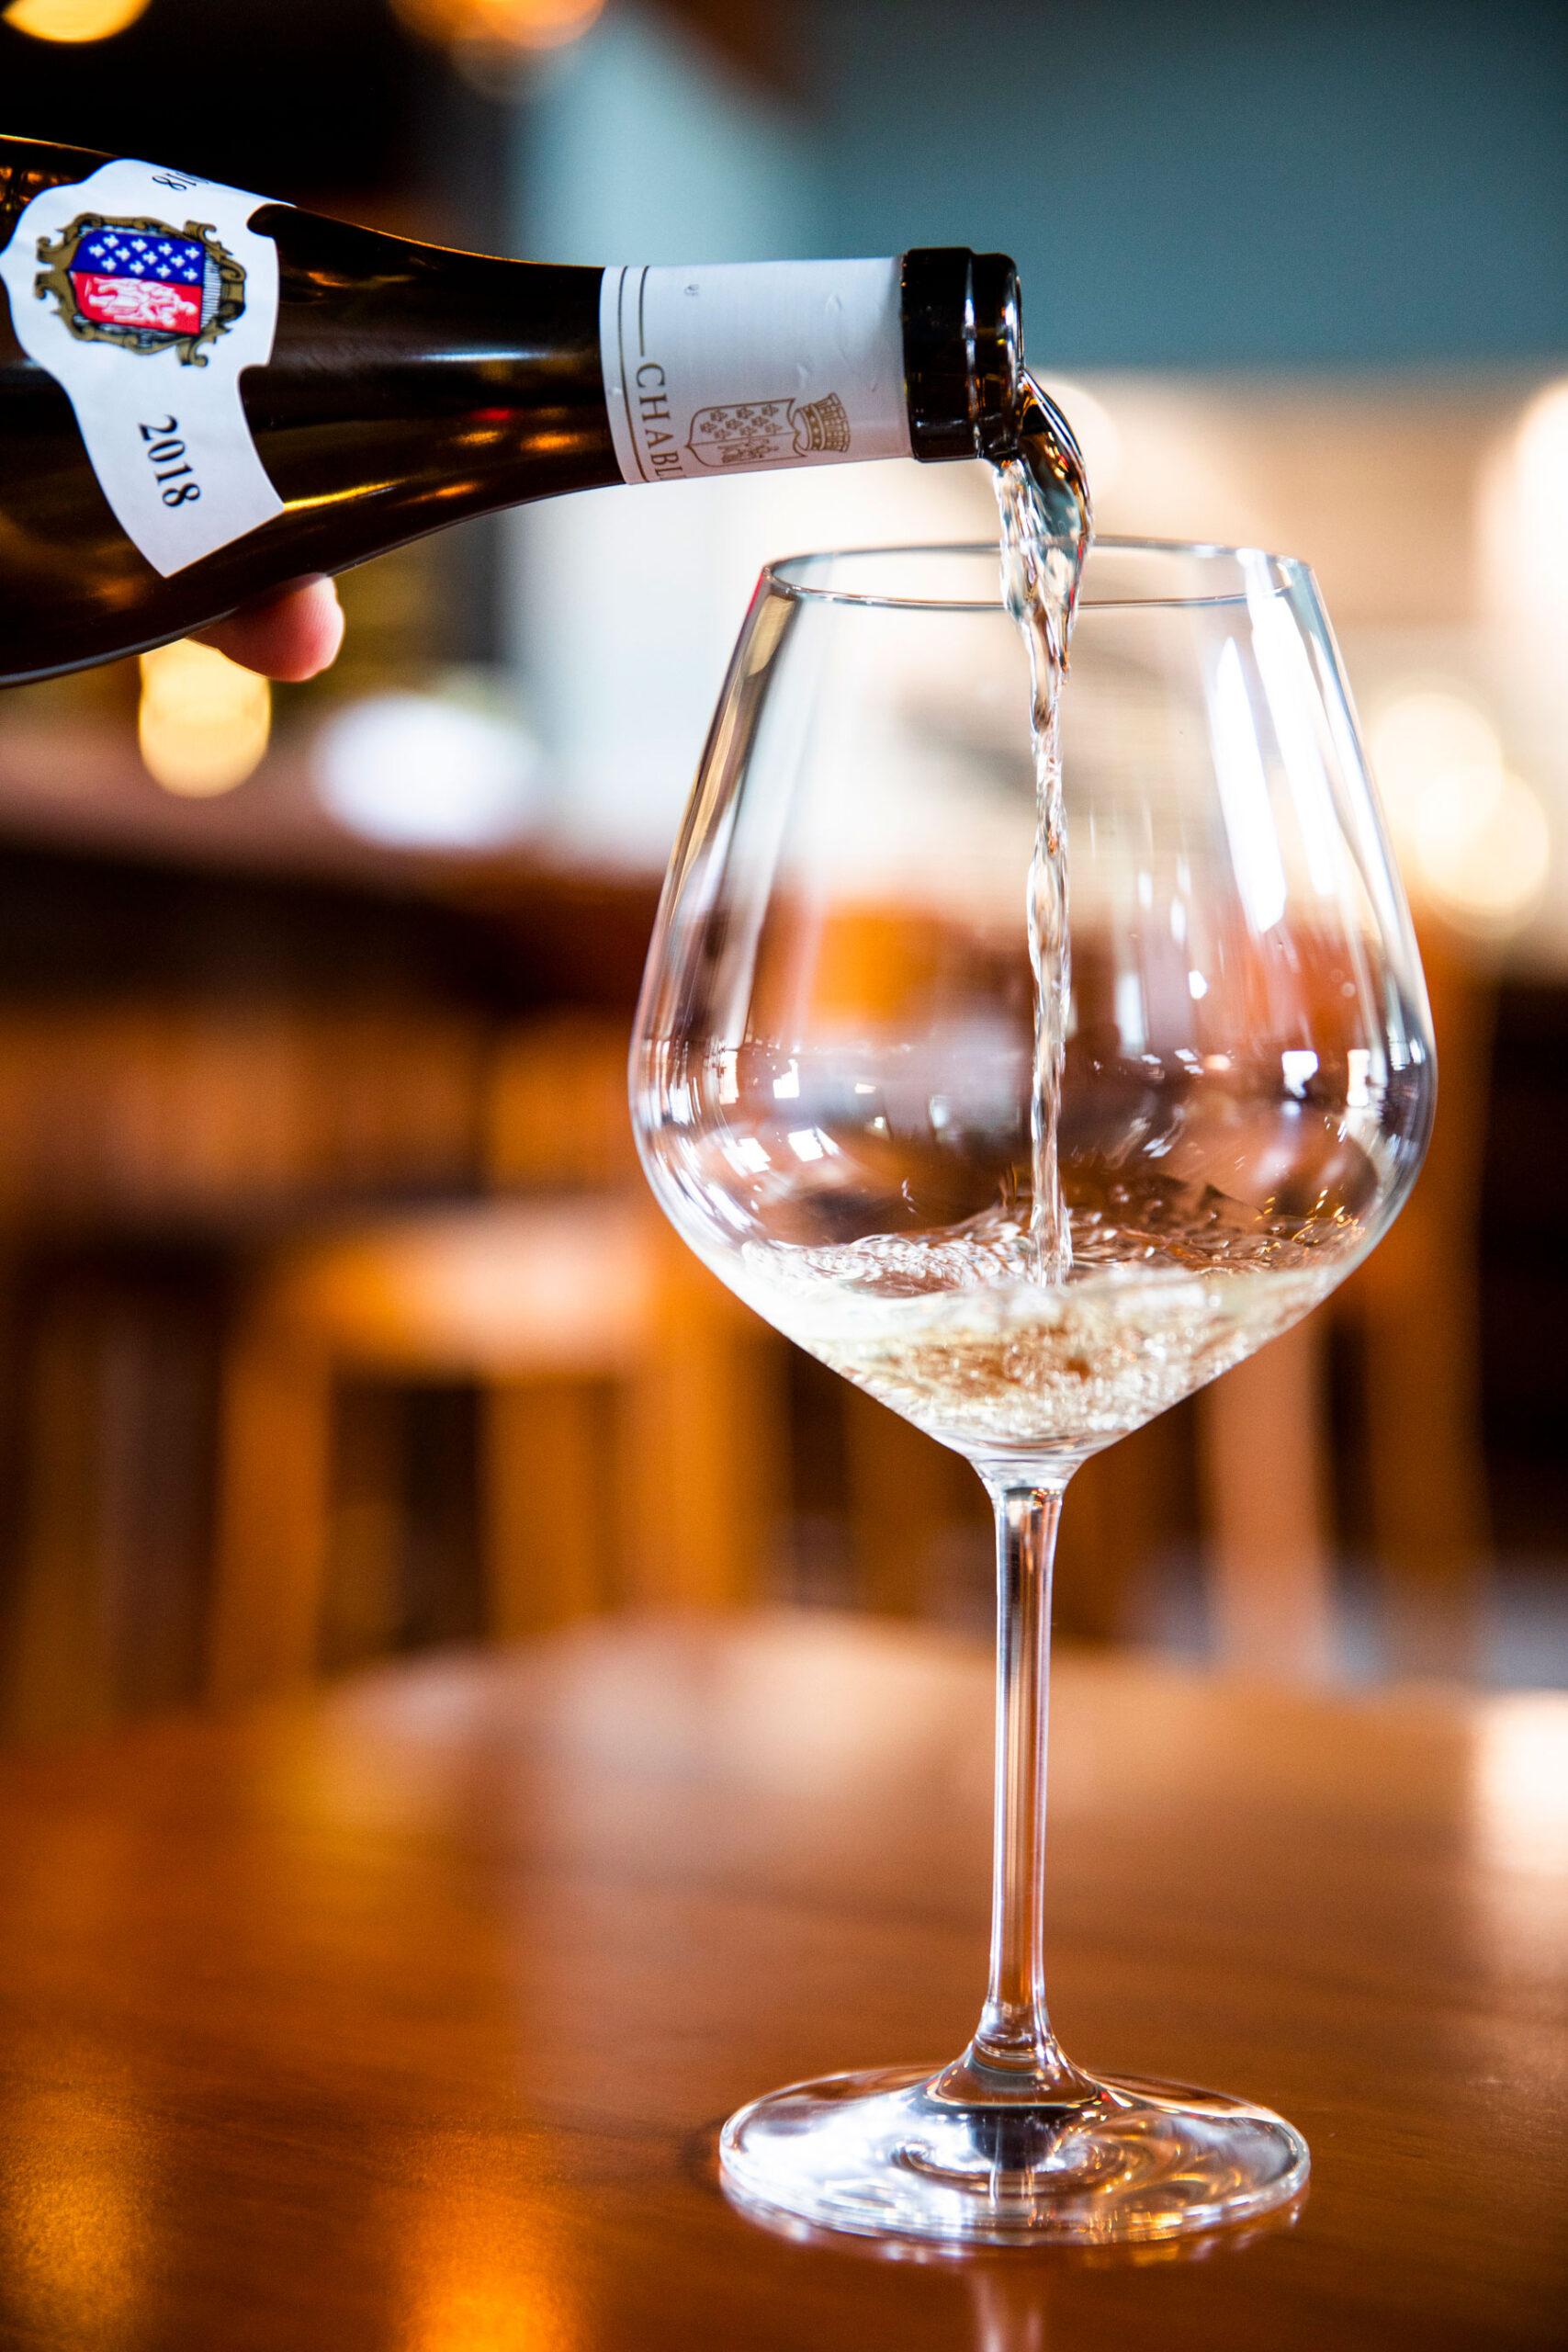 bicyclette-wine-pour